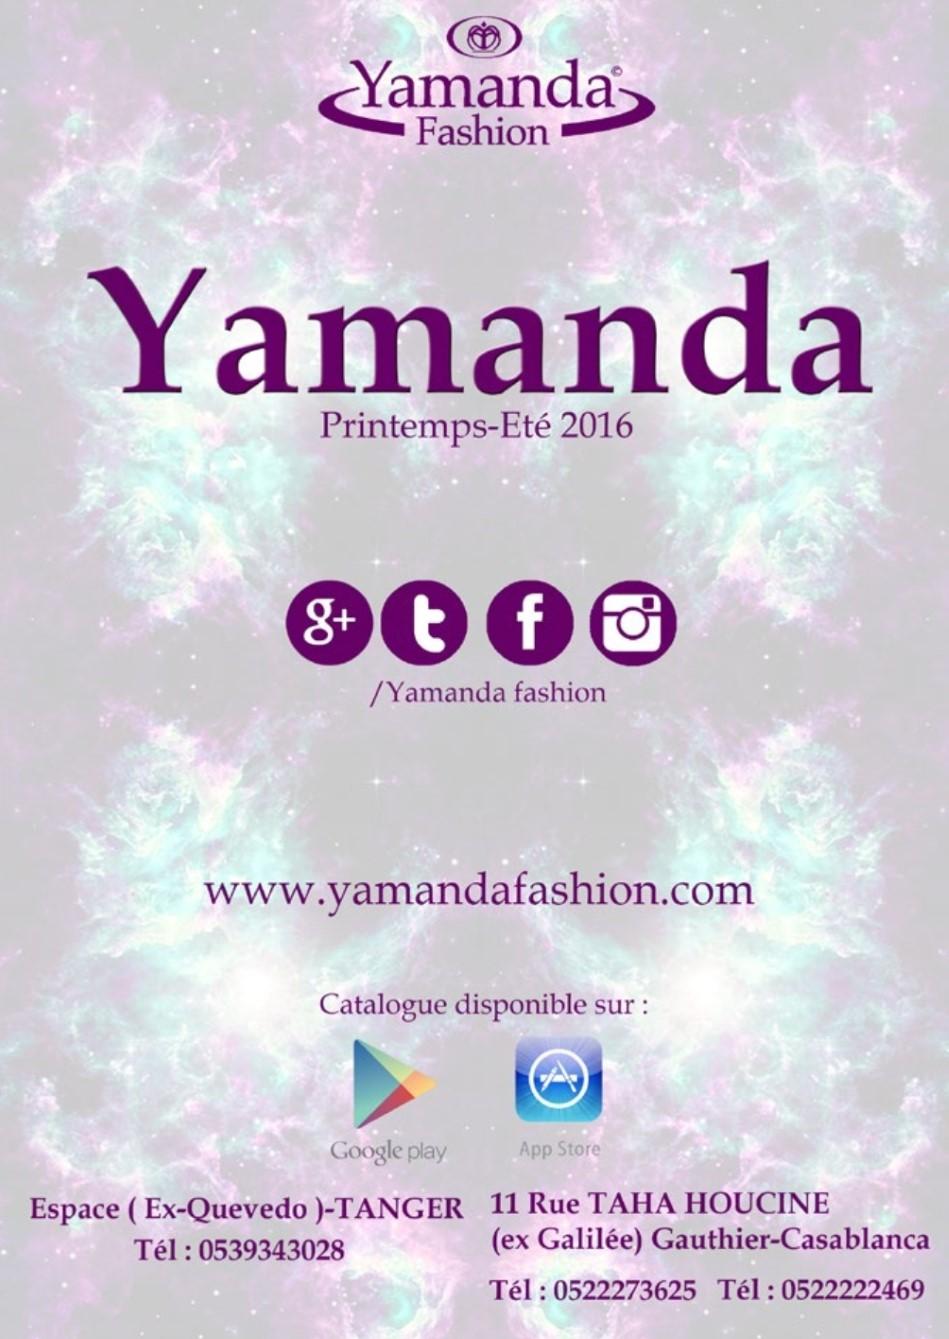 YAMANDA-CATALOGUE-VERSION-FINAL-impression-site_179